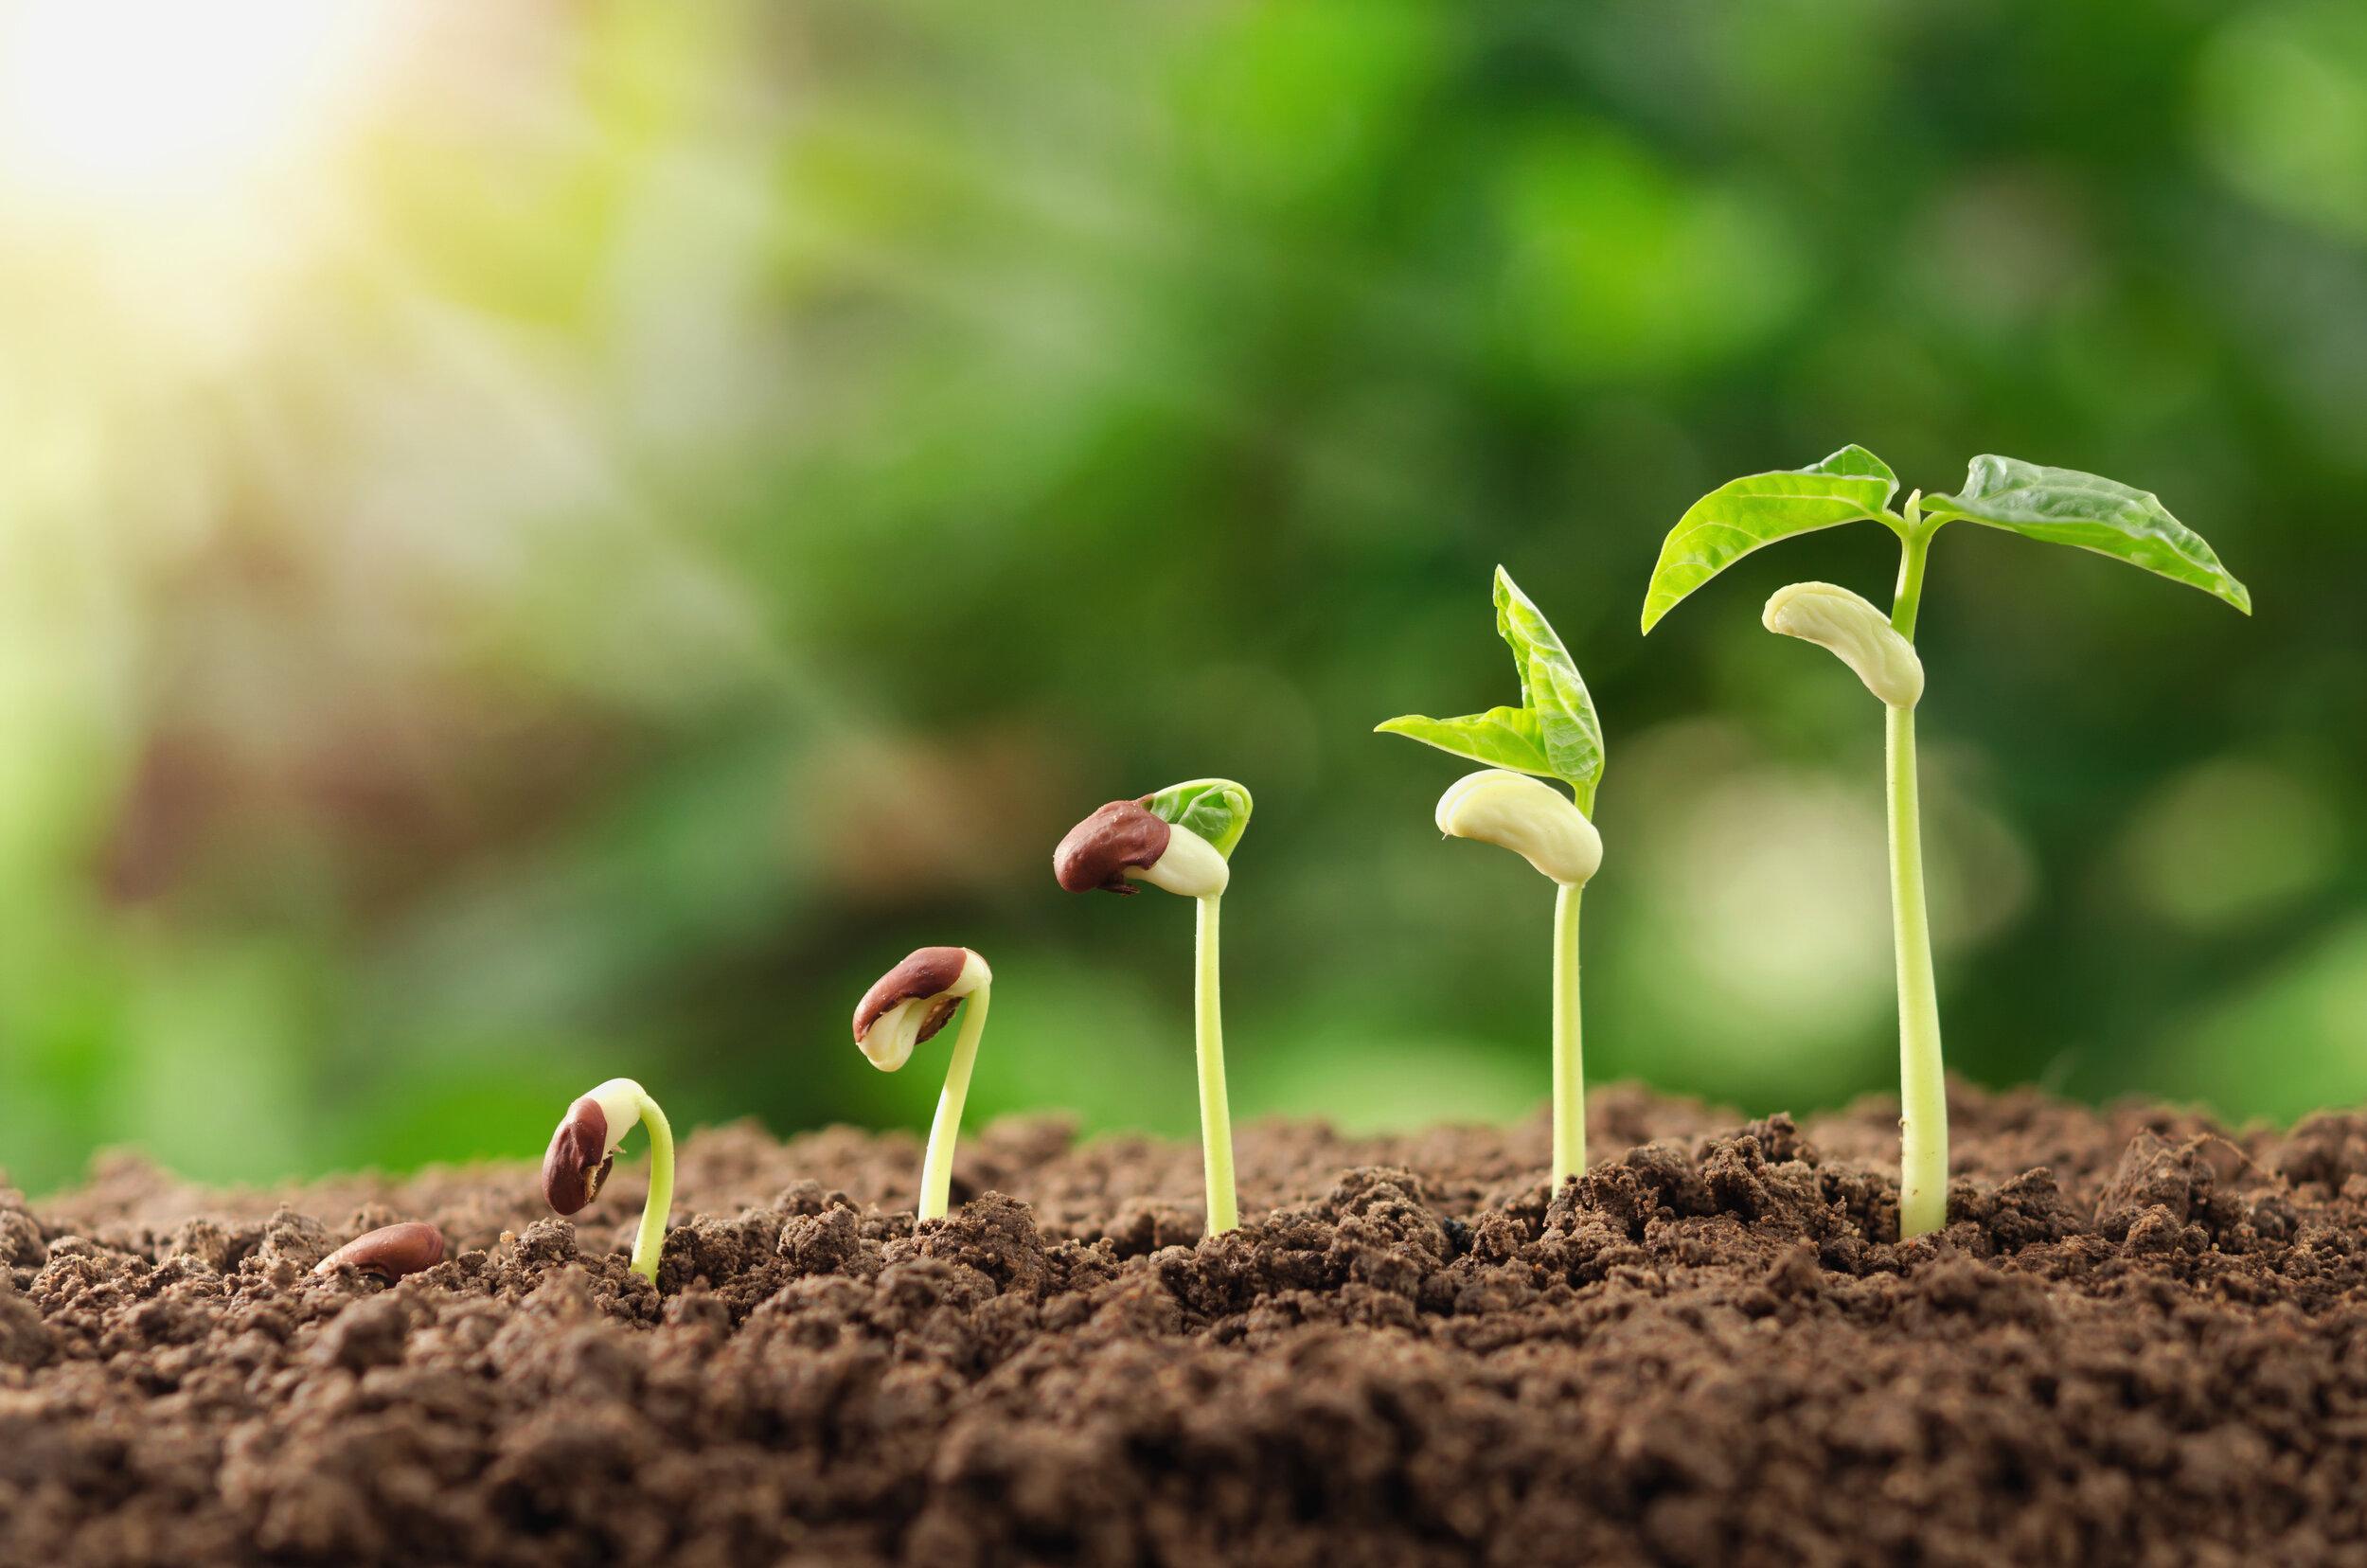 seeds growing integration group image.jpg